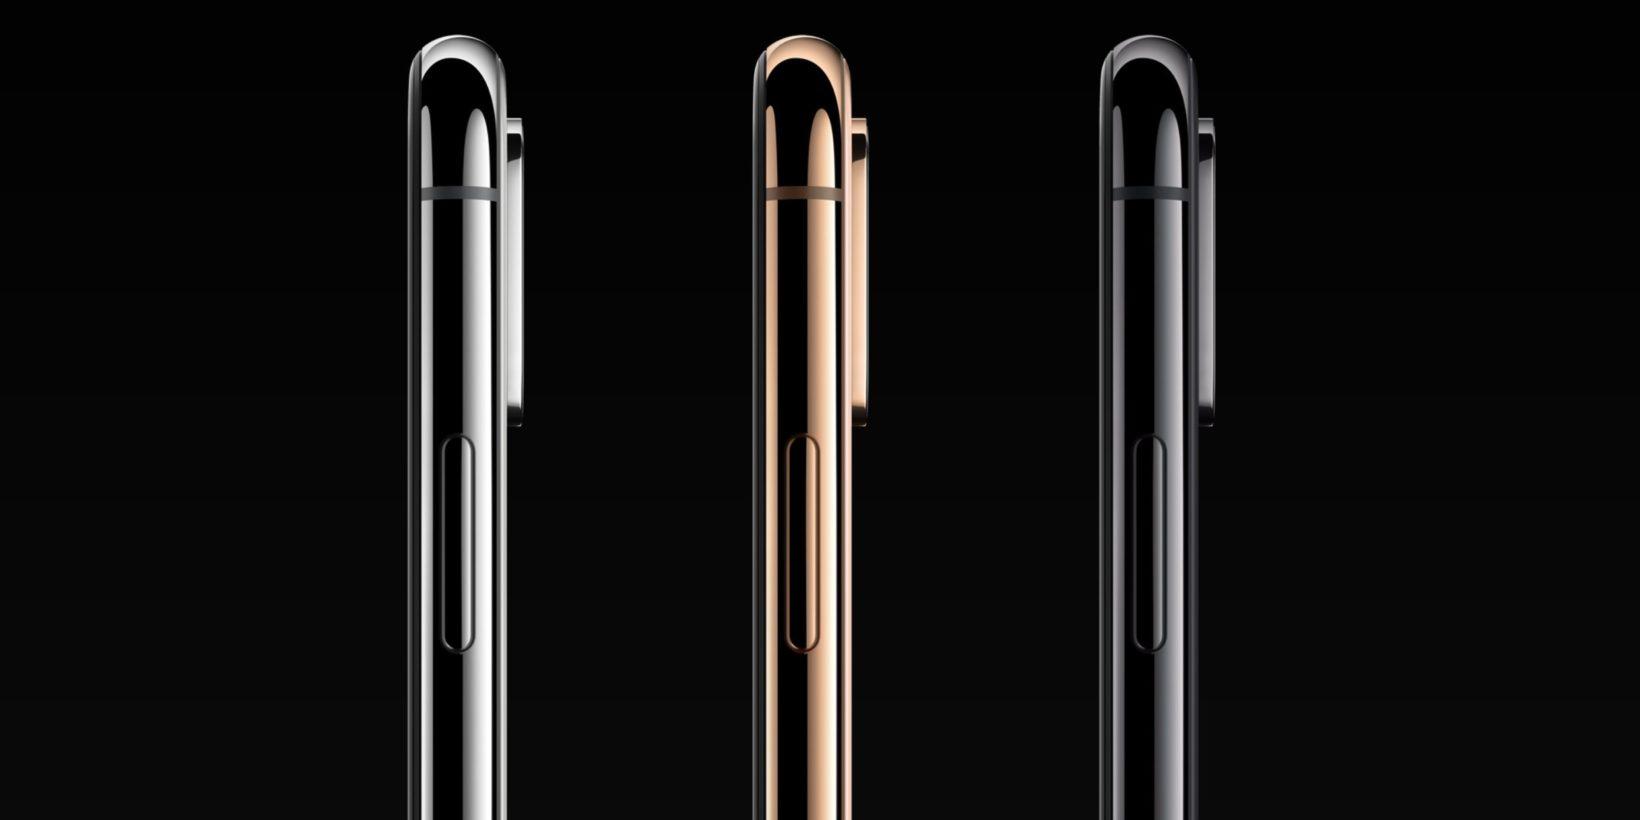 Apple rilascia iOS 12.1.3, watchOS 5.1.3 e tvOS 12.1.2 beta 3 agli sviluppatori